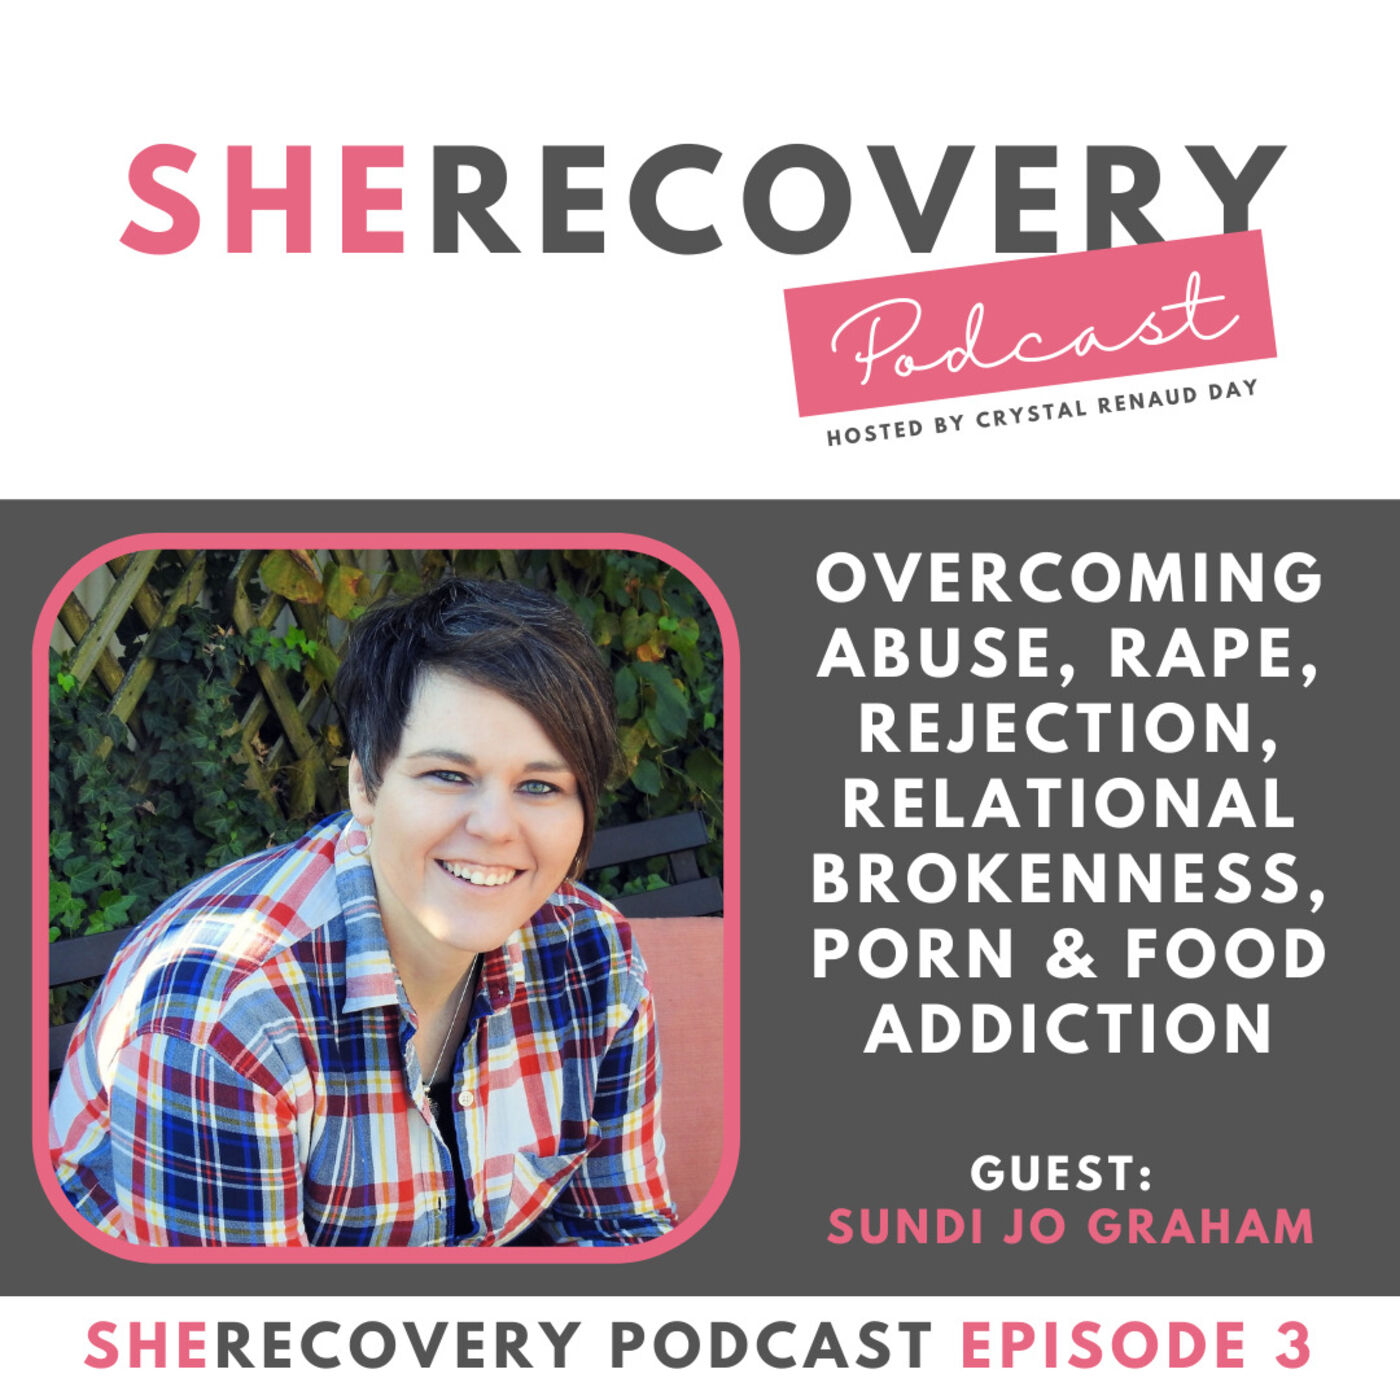 S1 E3: Sundi Jo Graham - Overcoming Abuse, Rape, Rejection, Relational Brokenness, Porn & Food Addiction